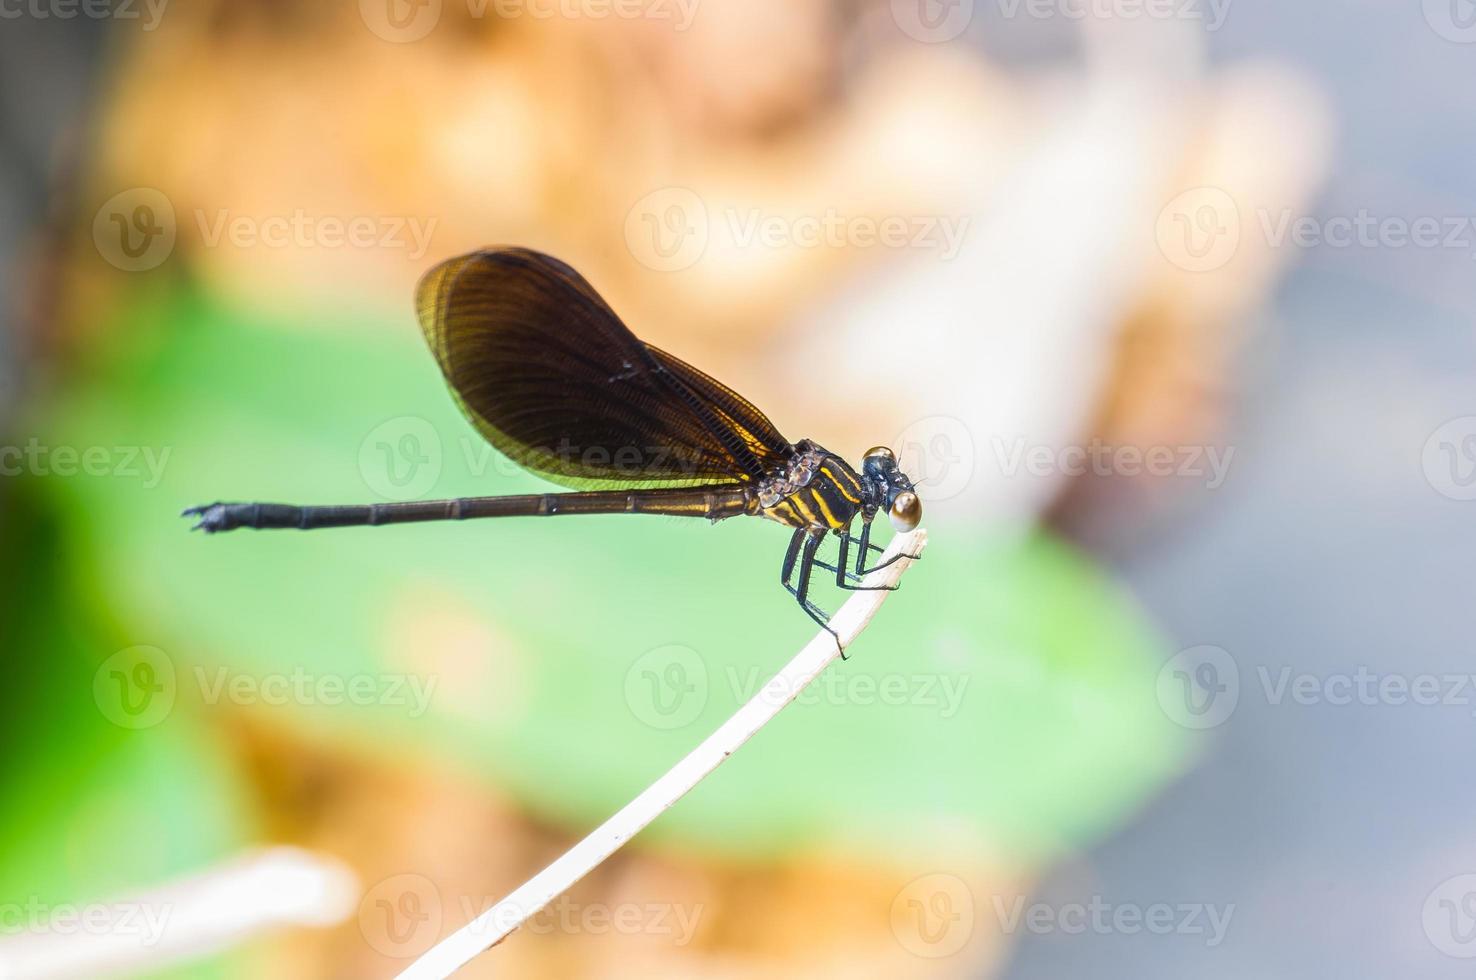 Dragon fly close-up foto